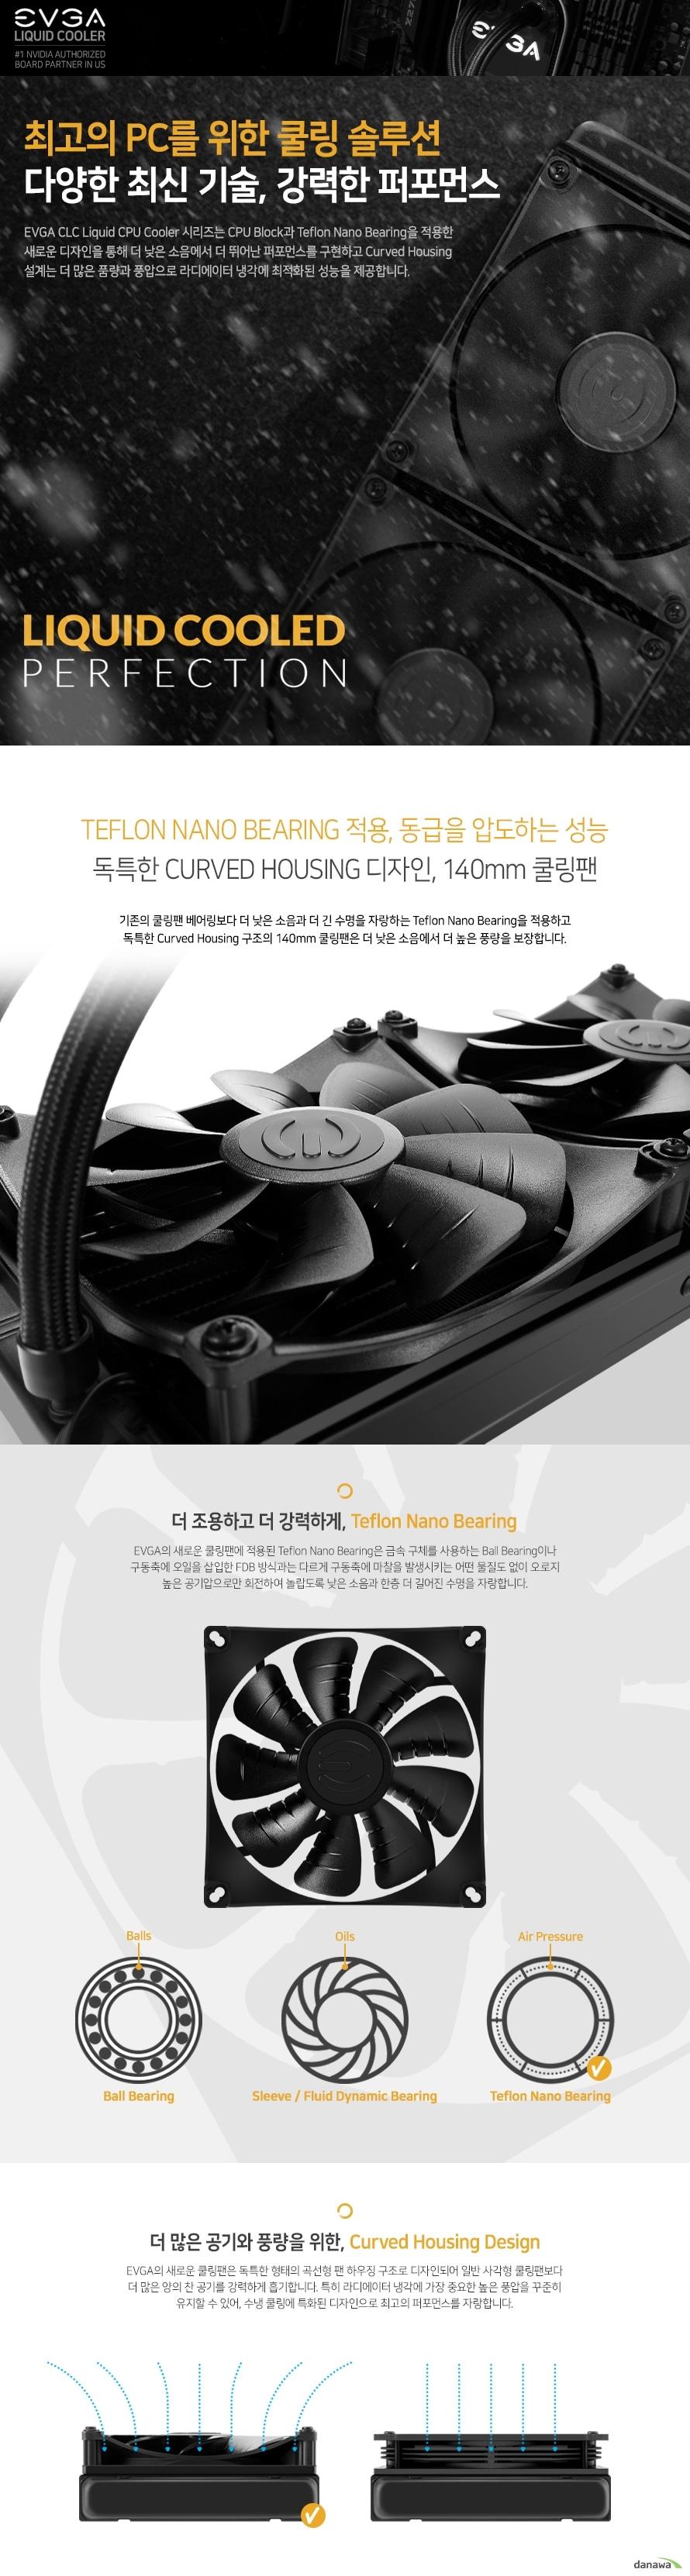 EVGA CLC Liquid CPU Cooler 시리즈는 CPU Block과 Teflon Nano Bearing을 적용한 새로운 디자인을 통해 더 낮은 소음에서 더 뛰어난 퍼포먼스를 구현하고 Curved Housing 설계는 더 많은 품량과 풍압으로 라디에이터 냉각에 최적화된 성능을 제공합니다. 기존의 쿨링팬 베어링보다 더 낮은 소음과 더 긴 수명을 자랑하는 Teflon Nano Bearing을 적용하고 독특한 Curved Housing 구조의 140mm 쿨링팬은 더 낮은 소음에서 더 높은 풍량을 보장합니다. EVGA의 새로운 쿨링팬에 적용된 Teflon Nano Bearing은 금속 구체를 사용하는 Ball Bearing이나 구동축에 오일을 삽입한 FDB 방식과는 다르게 구동축에 마찰을 발생시키는 어떤 물질도 없이 오로지 높은 공기압으로만 회전하여 놀랍도록 낮은 소음과 한층 더 길어진 수명을 자랑합니다. EVGA의 새로운 쿨링팬은 독특한 형태의 곡선형 팬 하우징 구조로 디자인되어 일반 사각형 쿨링팬보다 더 많은 양의 찬 공기를 강력하게 흡기합니다. 특히 라디에이터 냉각에 가장 중요한 높은 풍압을 꾸준히 유지할 수 있어, 수냉 쿨링에 특화된 디자인으로 최고의 퍼포먼스를 자랑합니다.